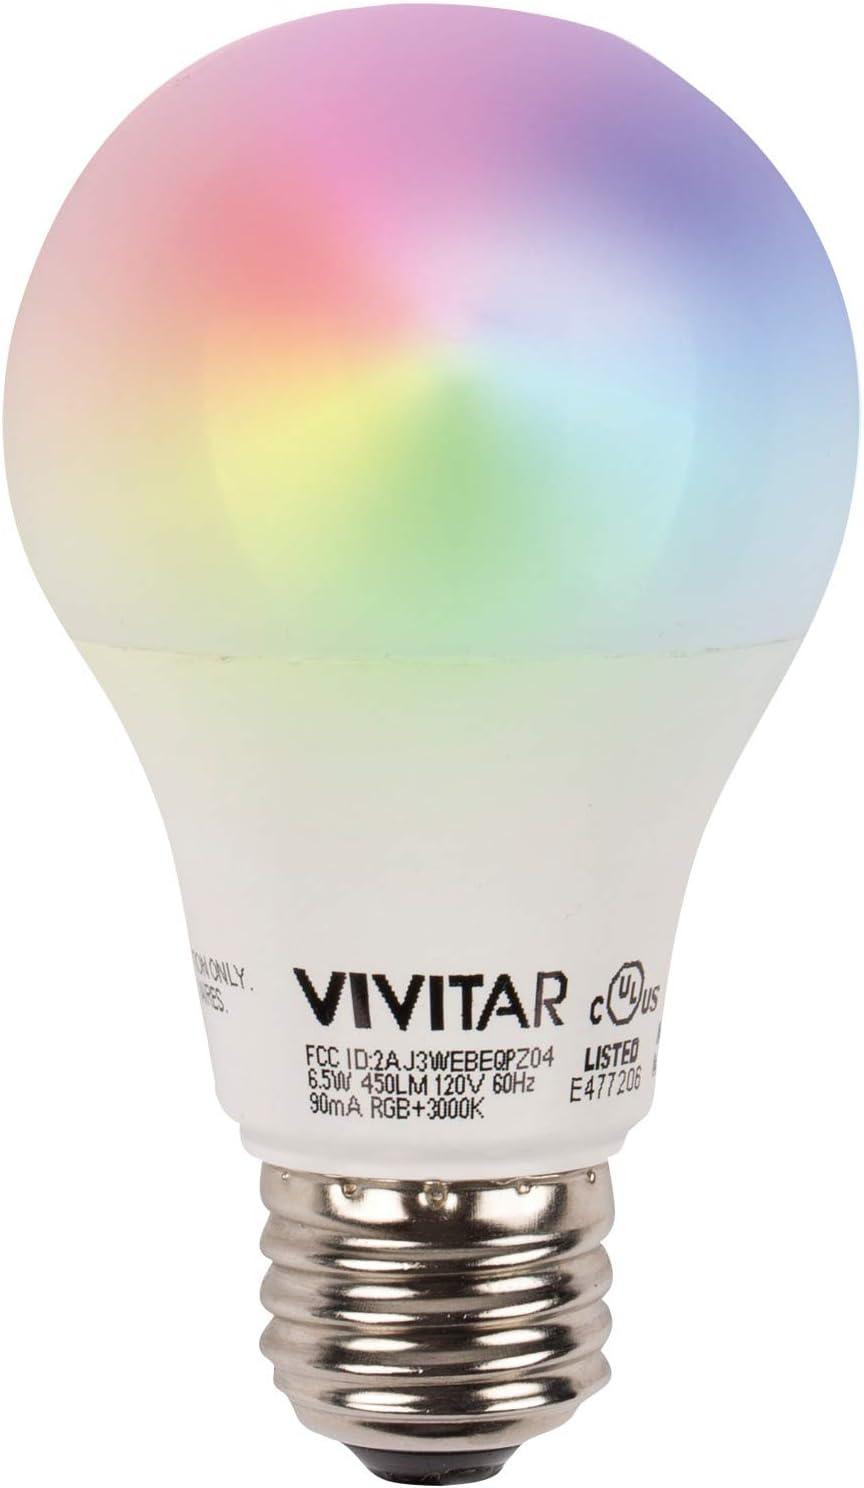 Vivitar LB45 Smart LED 800-Lumen Soft White Bulb